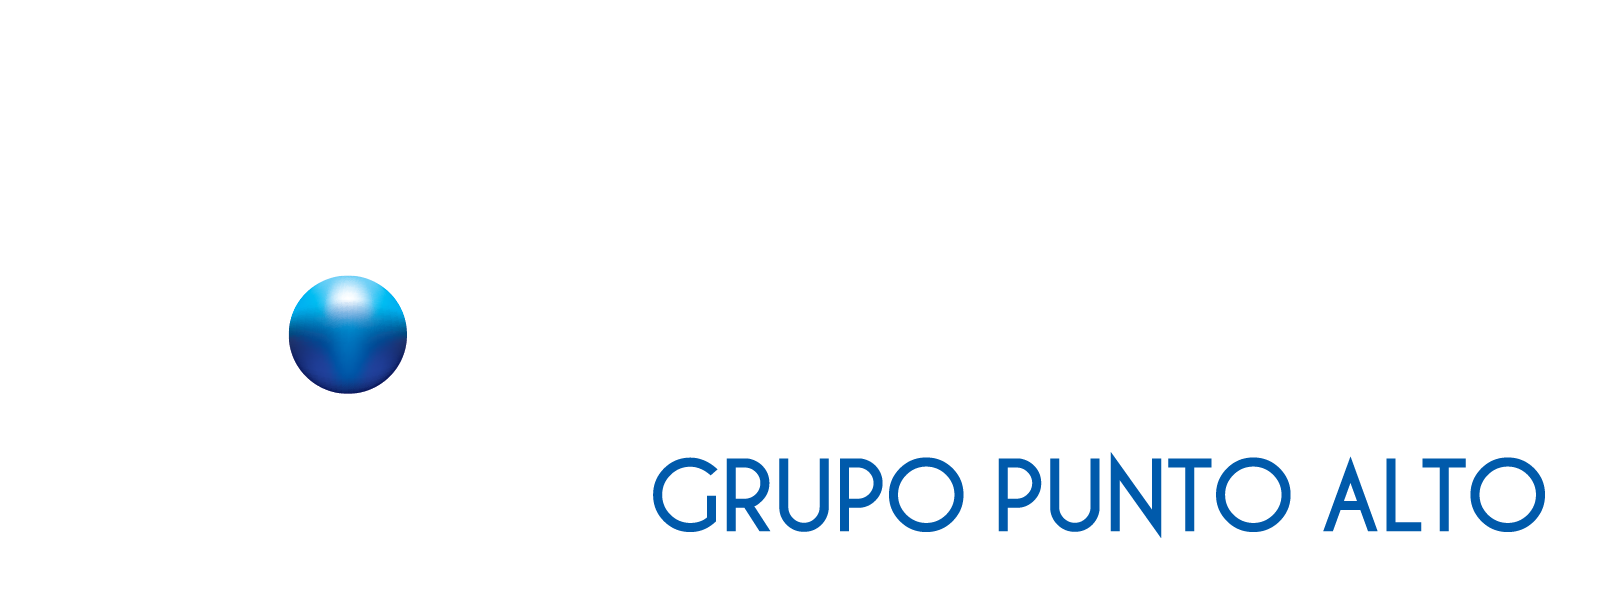 logotipo-GPA-blanco-01.png